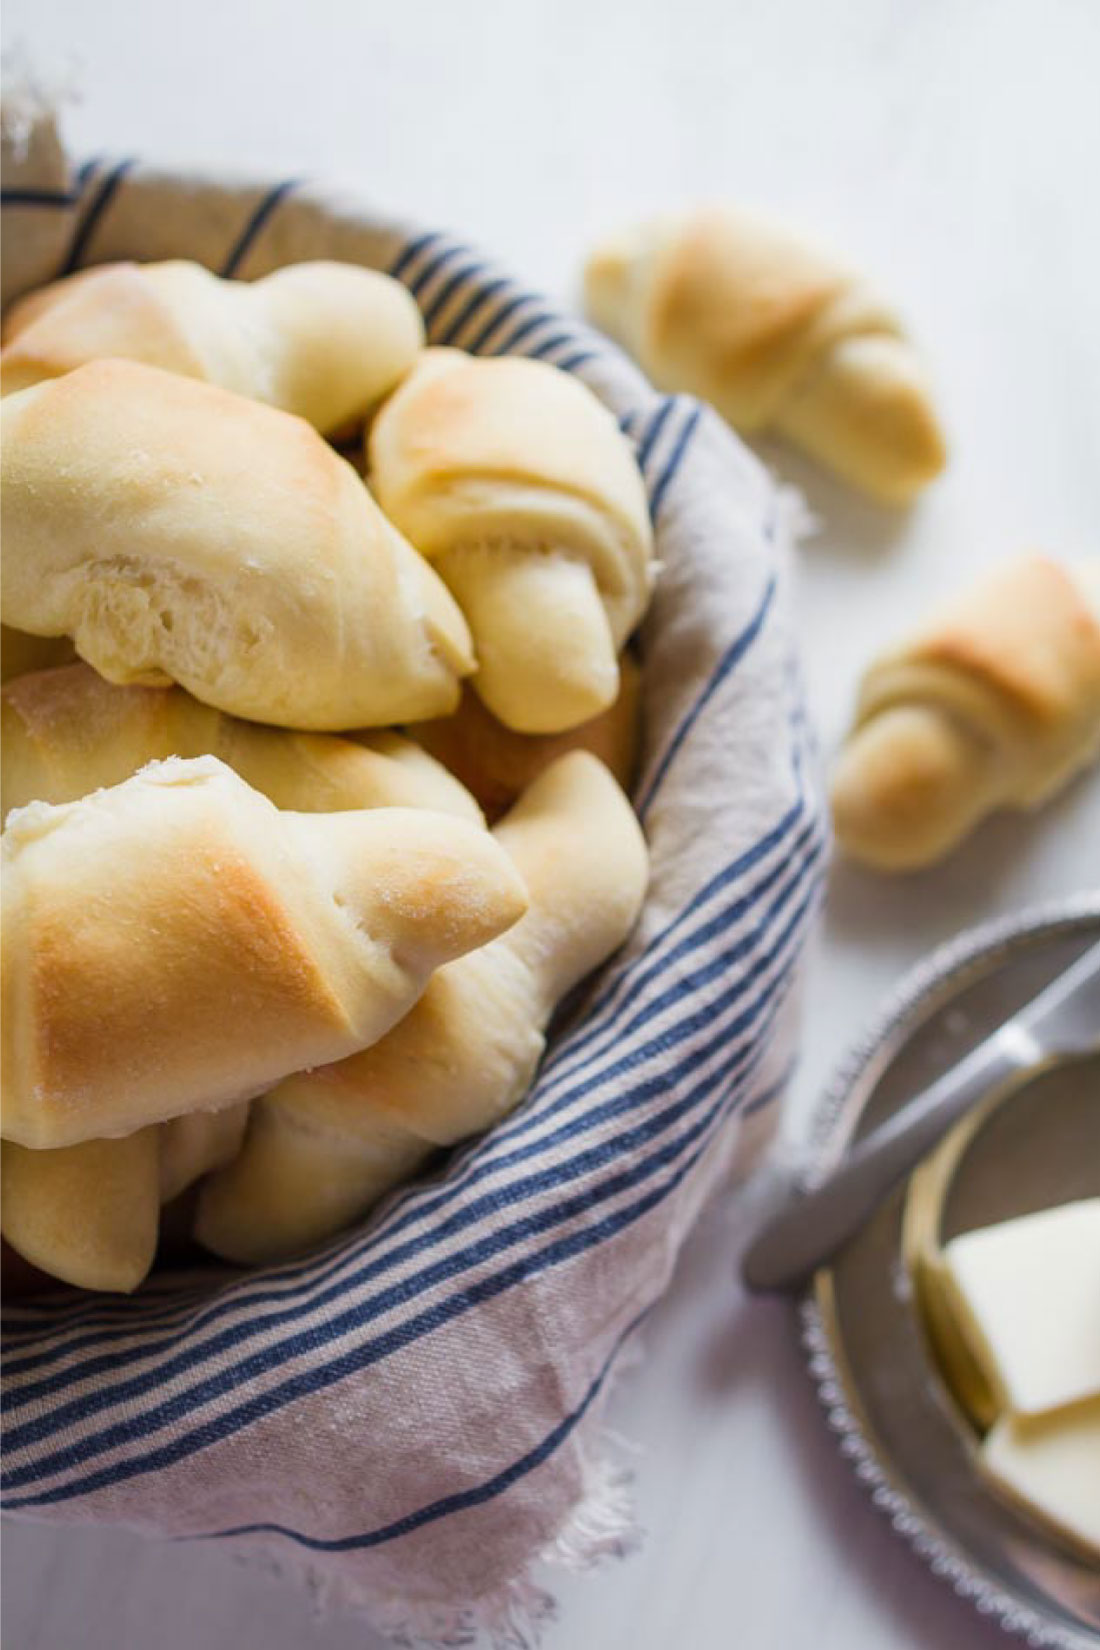 Food: The best dinner rolls - tasty, buttery, soft dinner rolls that will melt in your mouth. www.thirtyhandmadedays.com